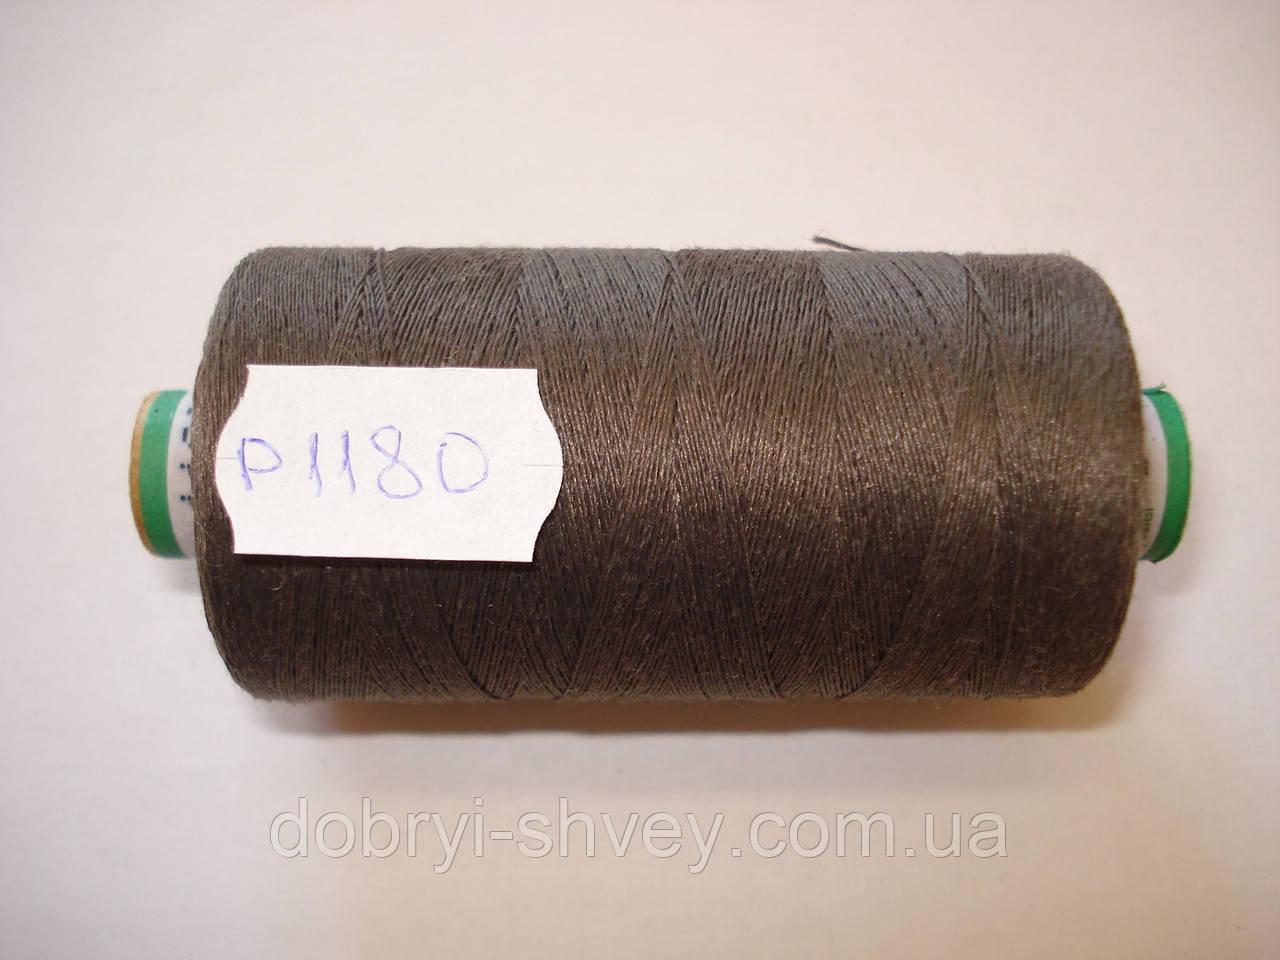 Нитка AMANN PAX №80 800м.col 1180 т.зеленый (шт.)